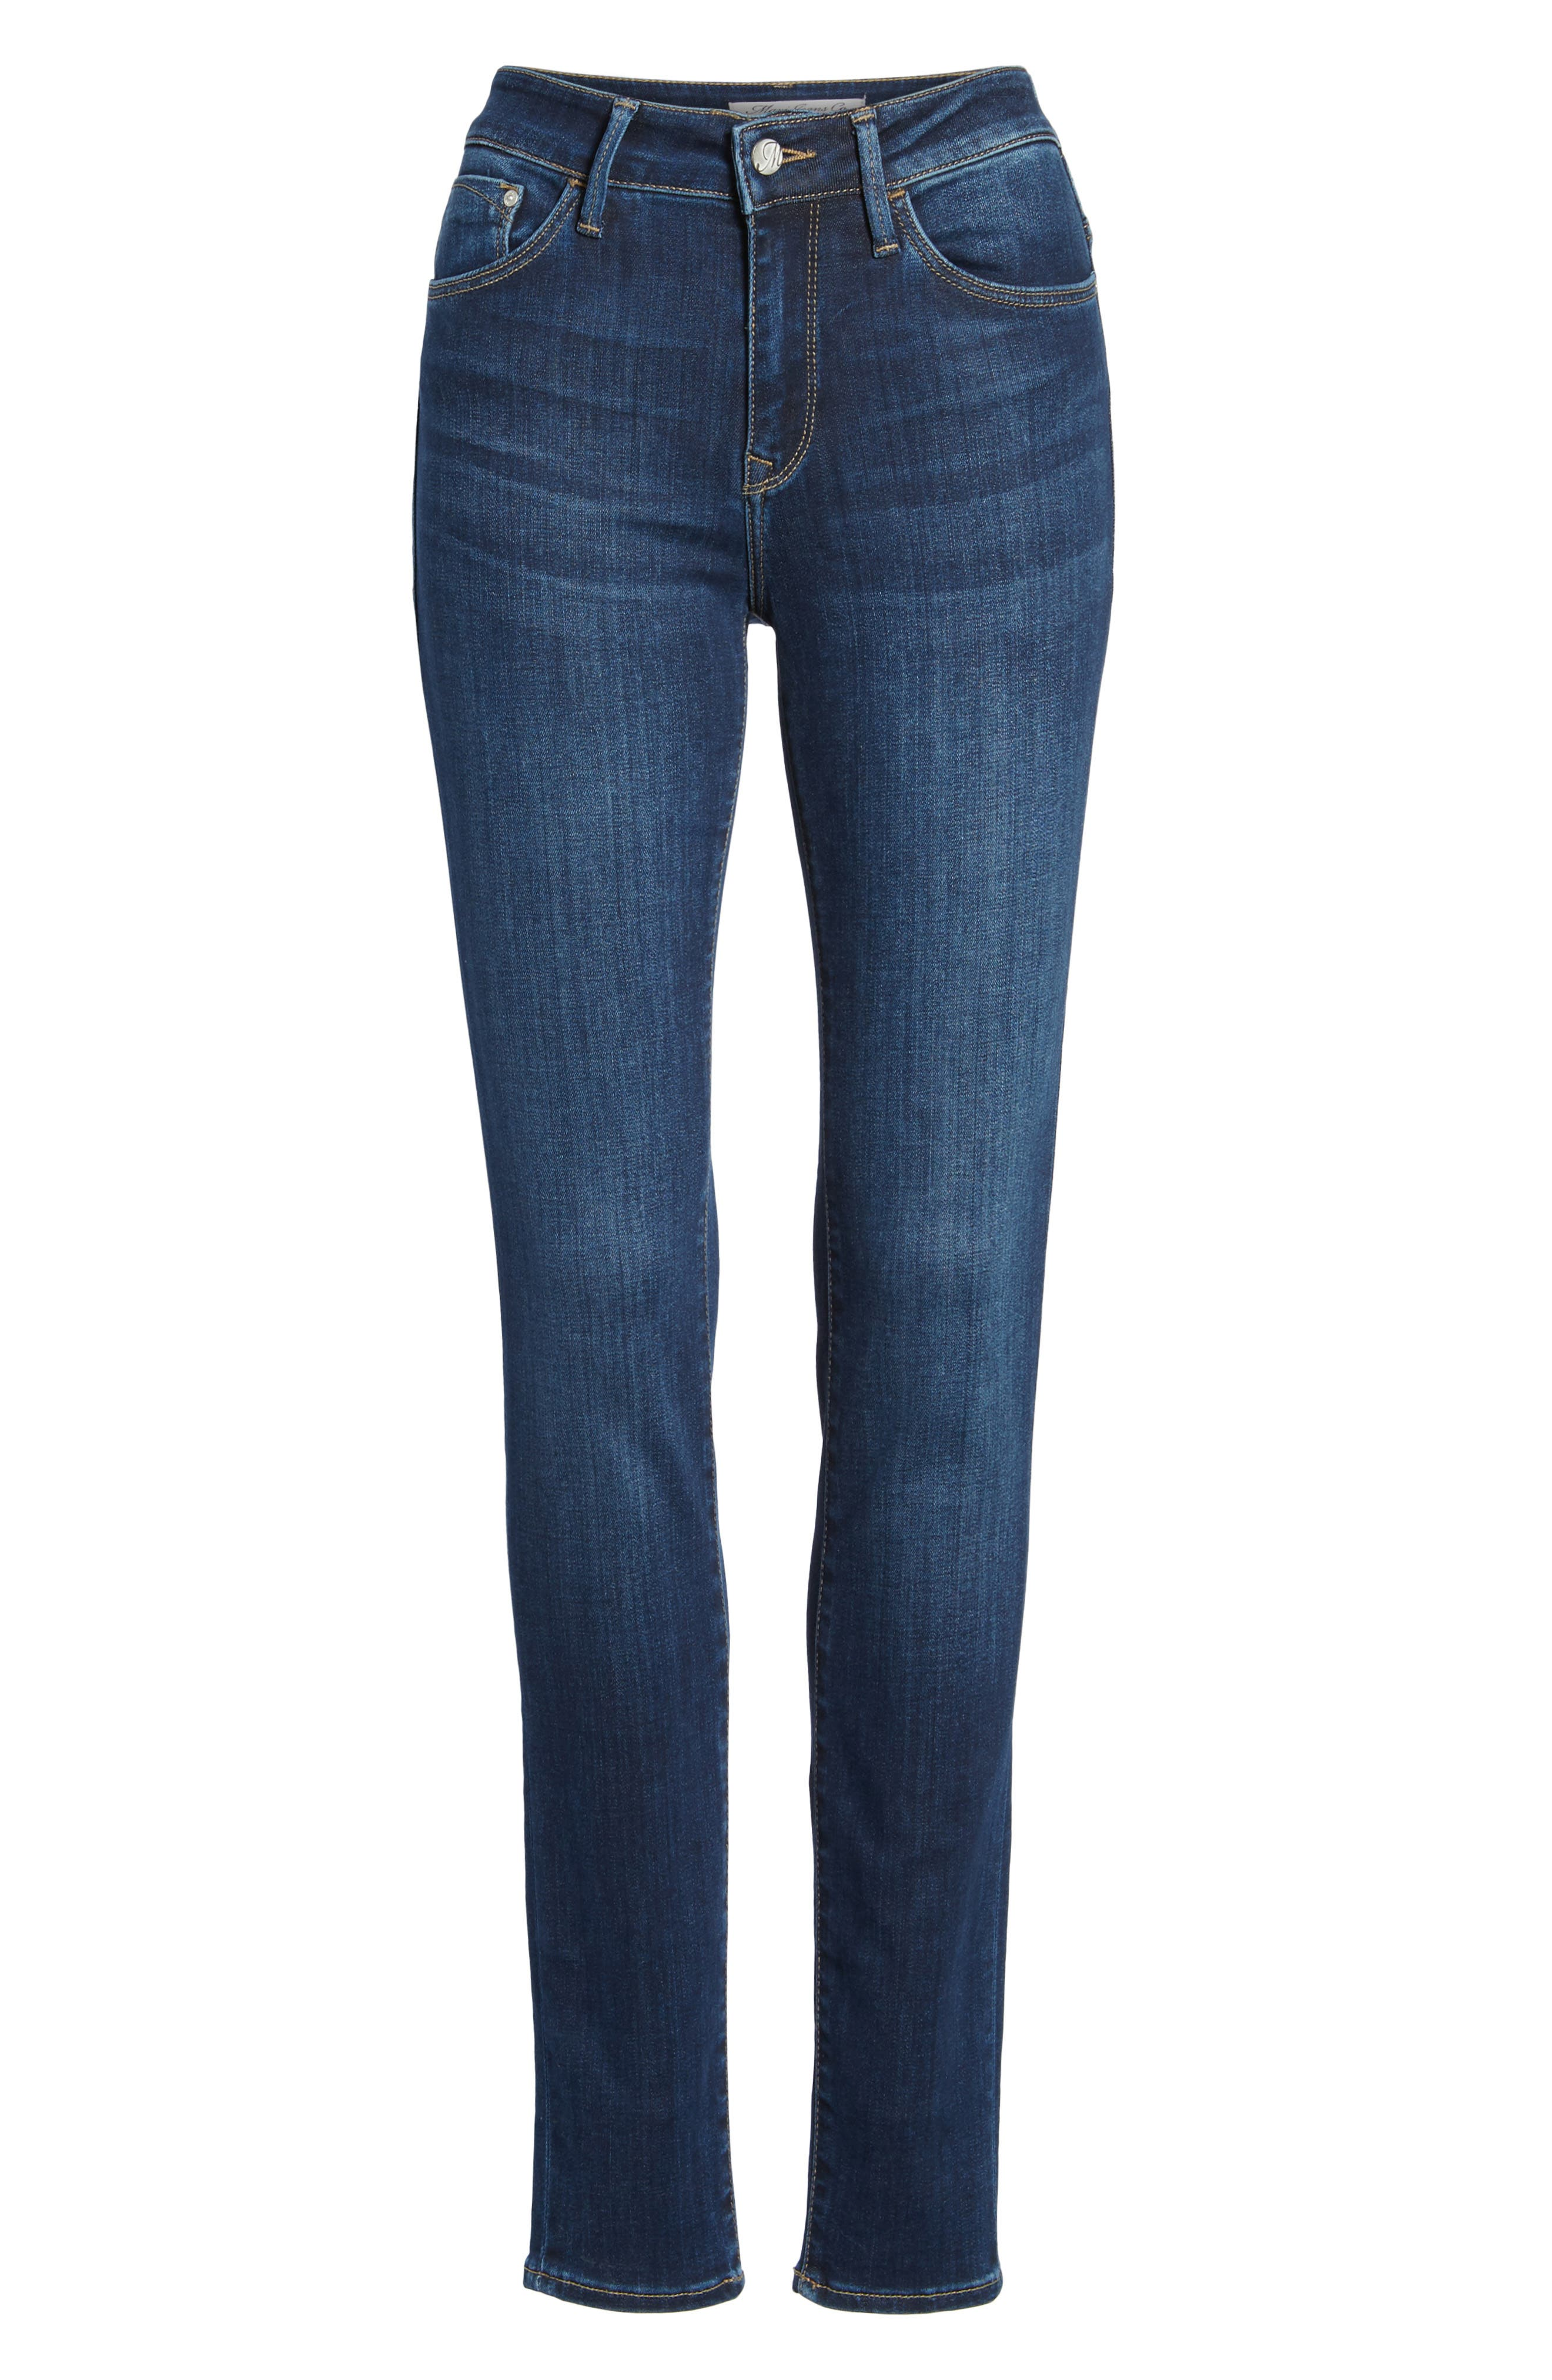 Alissa Skinny Jeans,                             Alternate thumbnail 7, color,                             Dark Supersoft